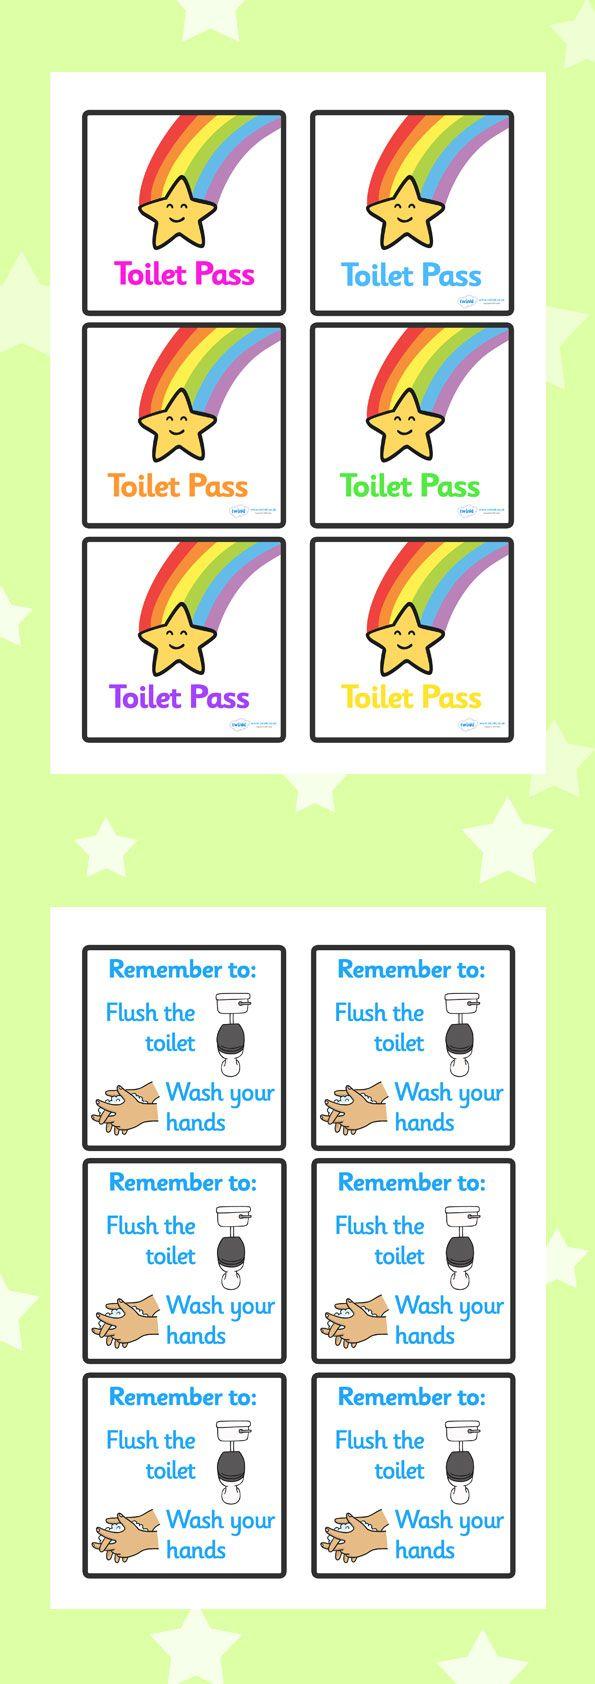 Toilet Passes Classroom Behavior Management Classroom